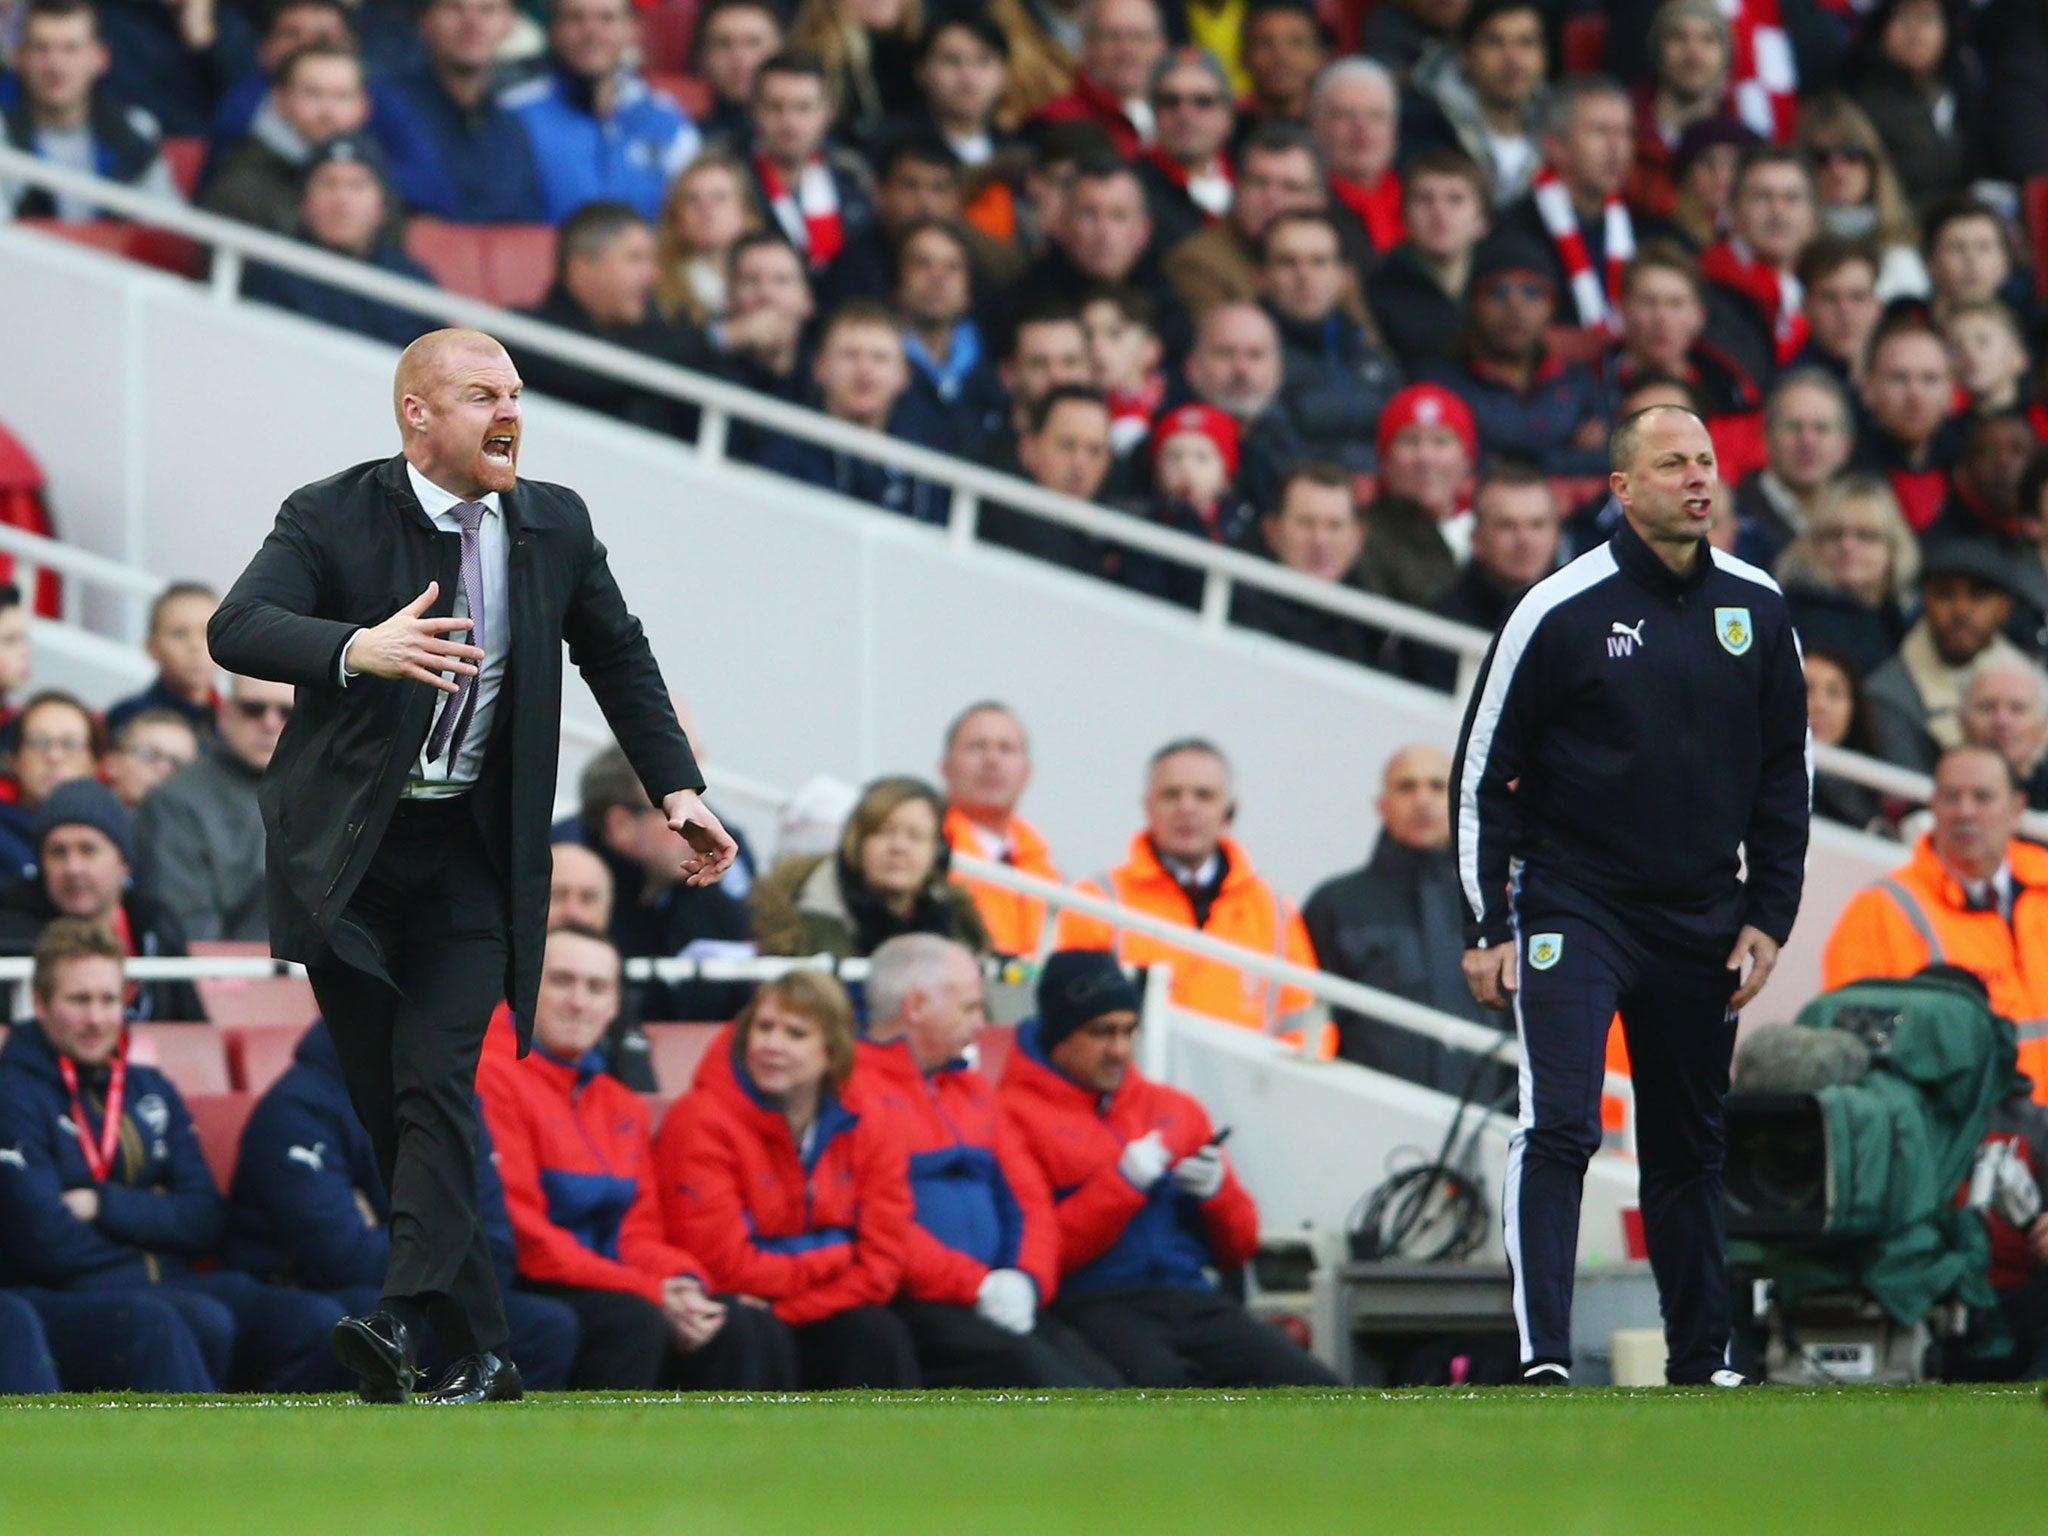 Arsenal 2 Burnley 1 player ratings: Alexis Sanchez and Alex